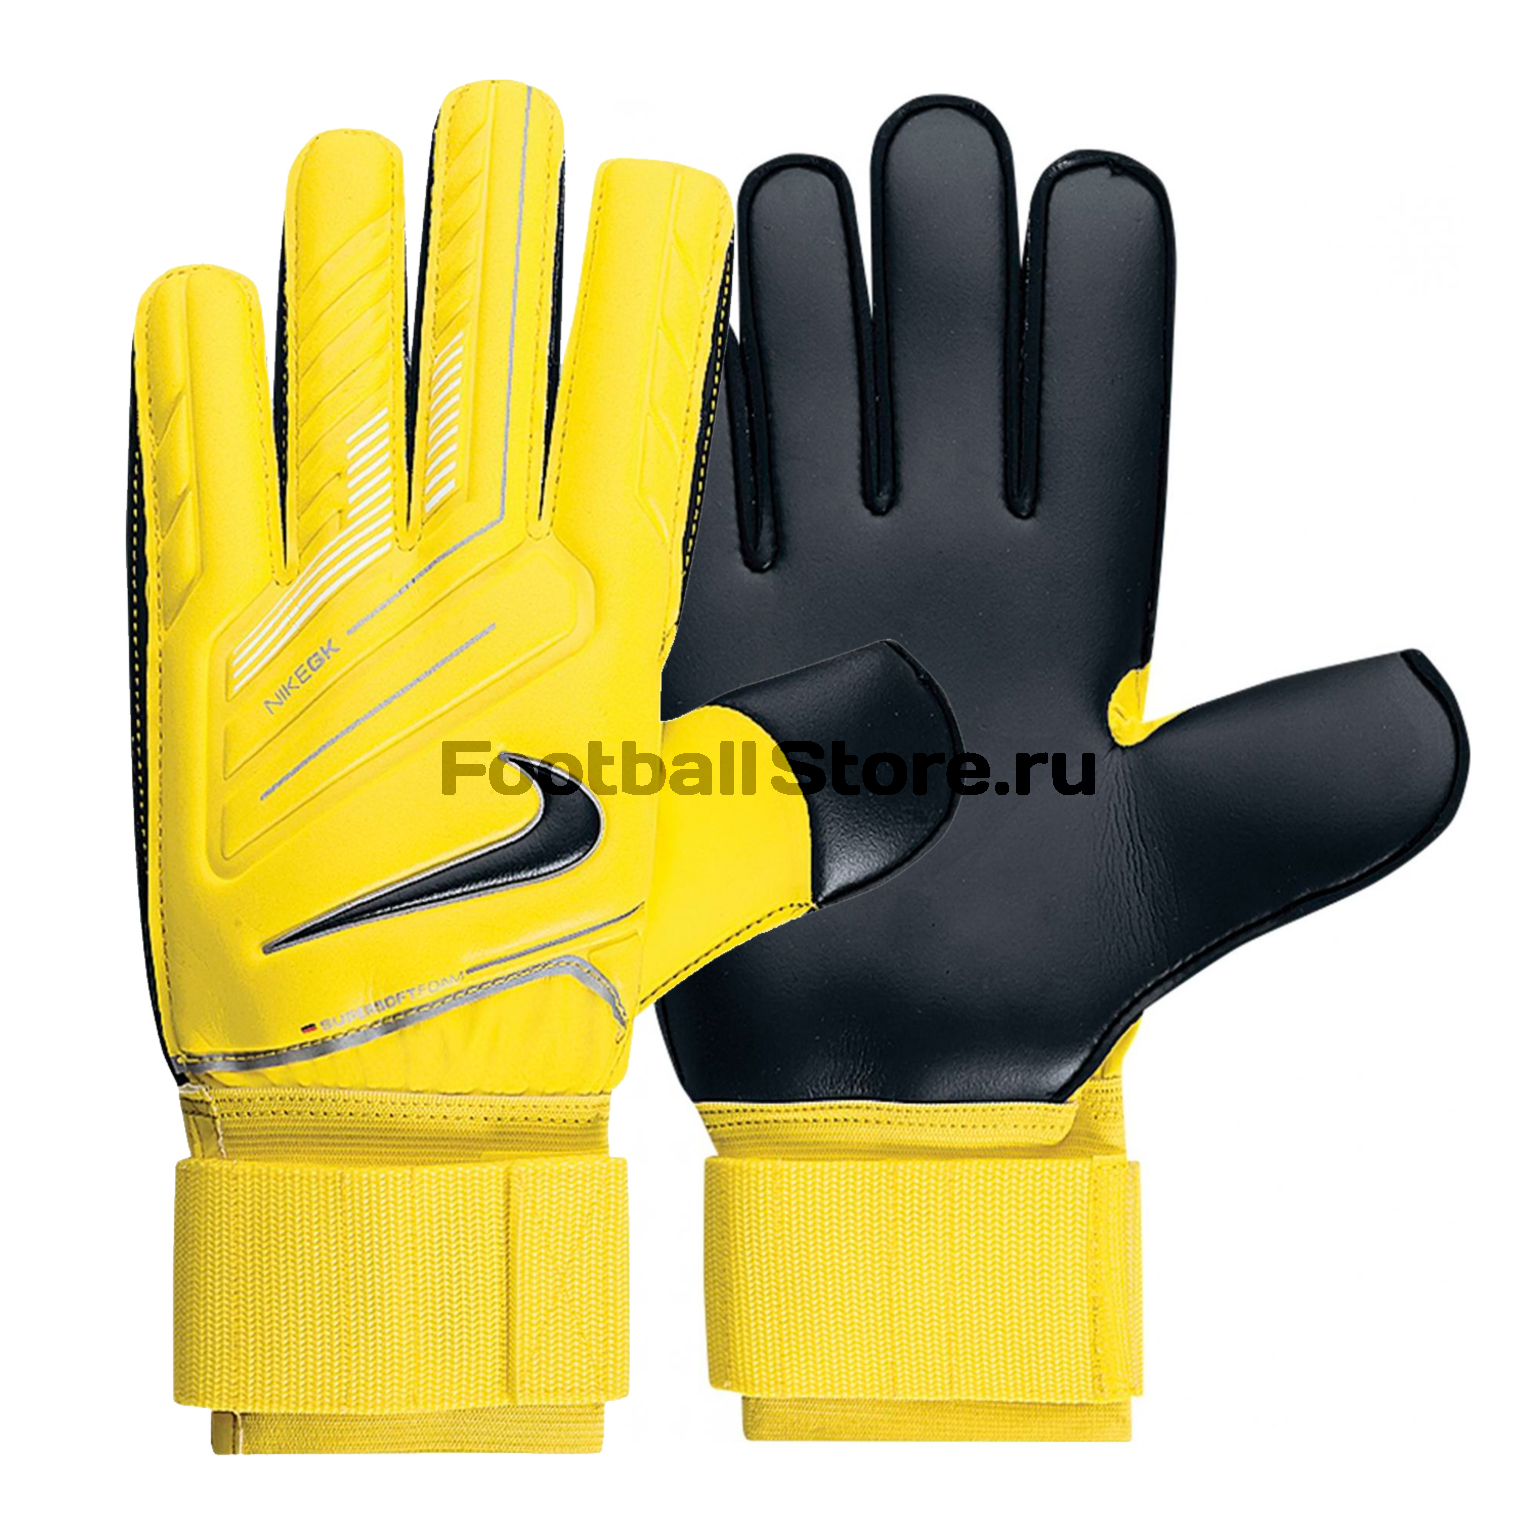 Перчатки Nike Перчатки вратарские Nike GK Spyne Pro GS0257-770